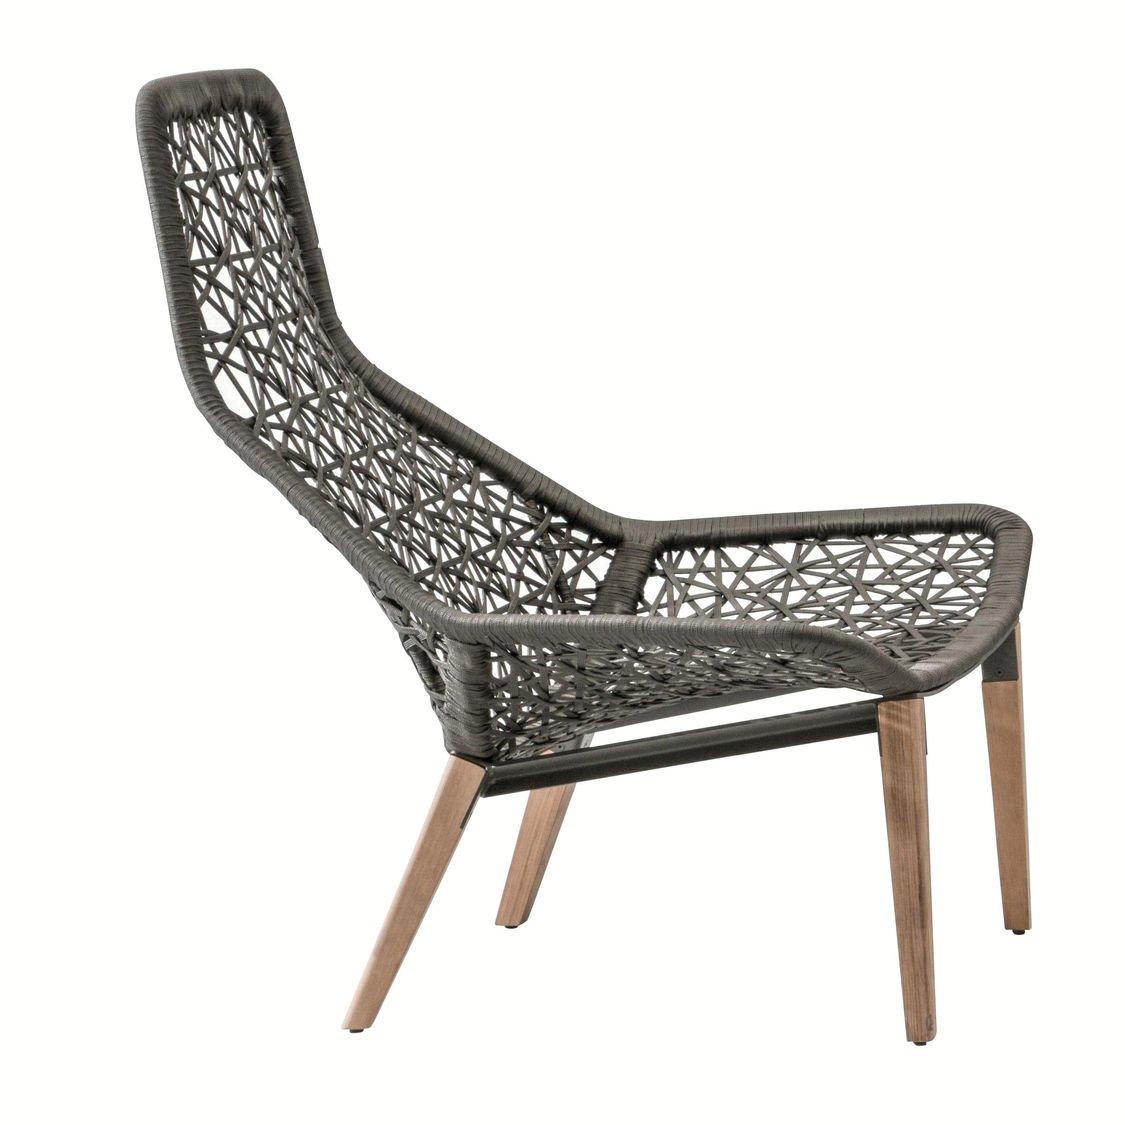 Kettal Maia Relax - Sillón de jardín patas de madera | AmbienteDirect